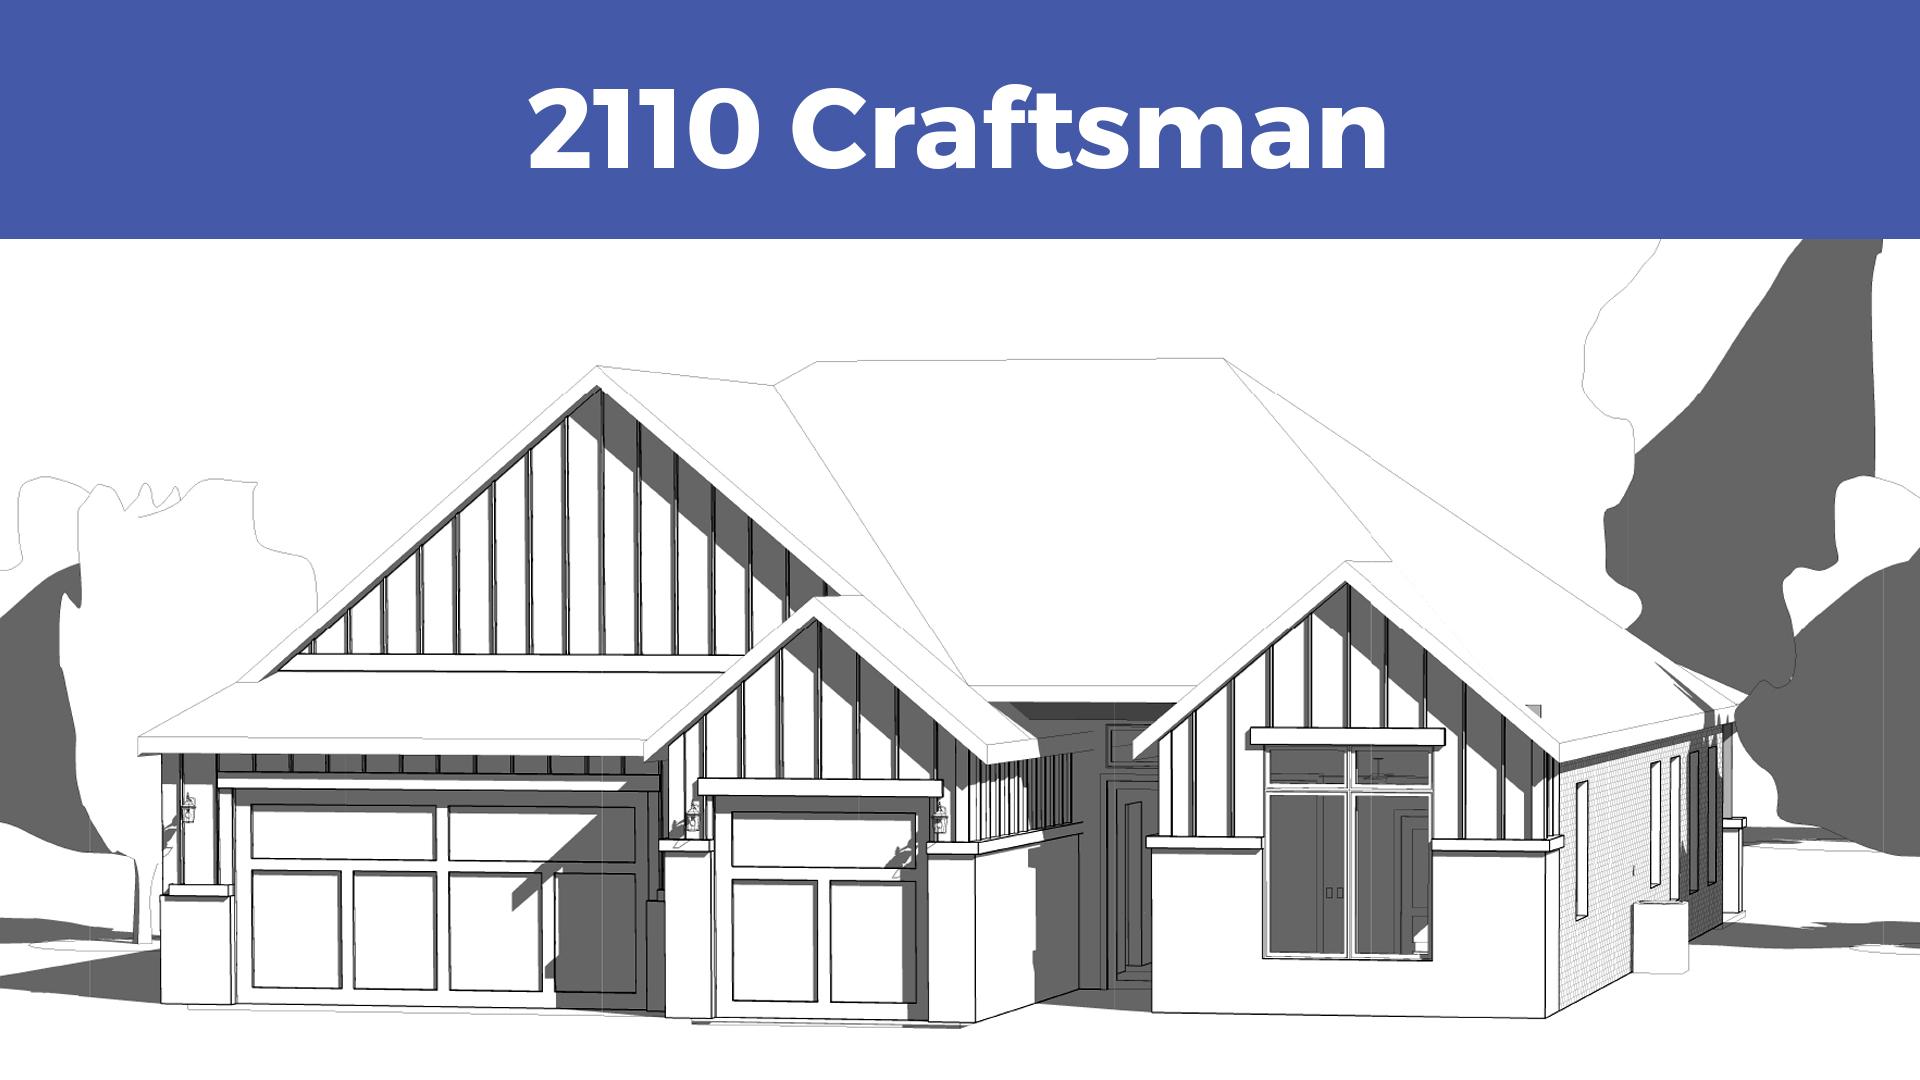 2110 Craftsman